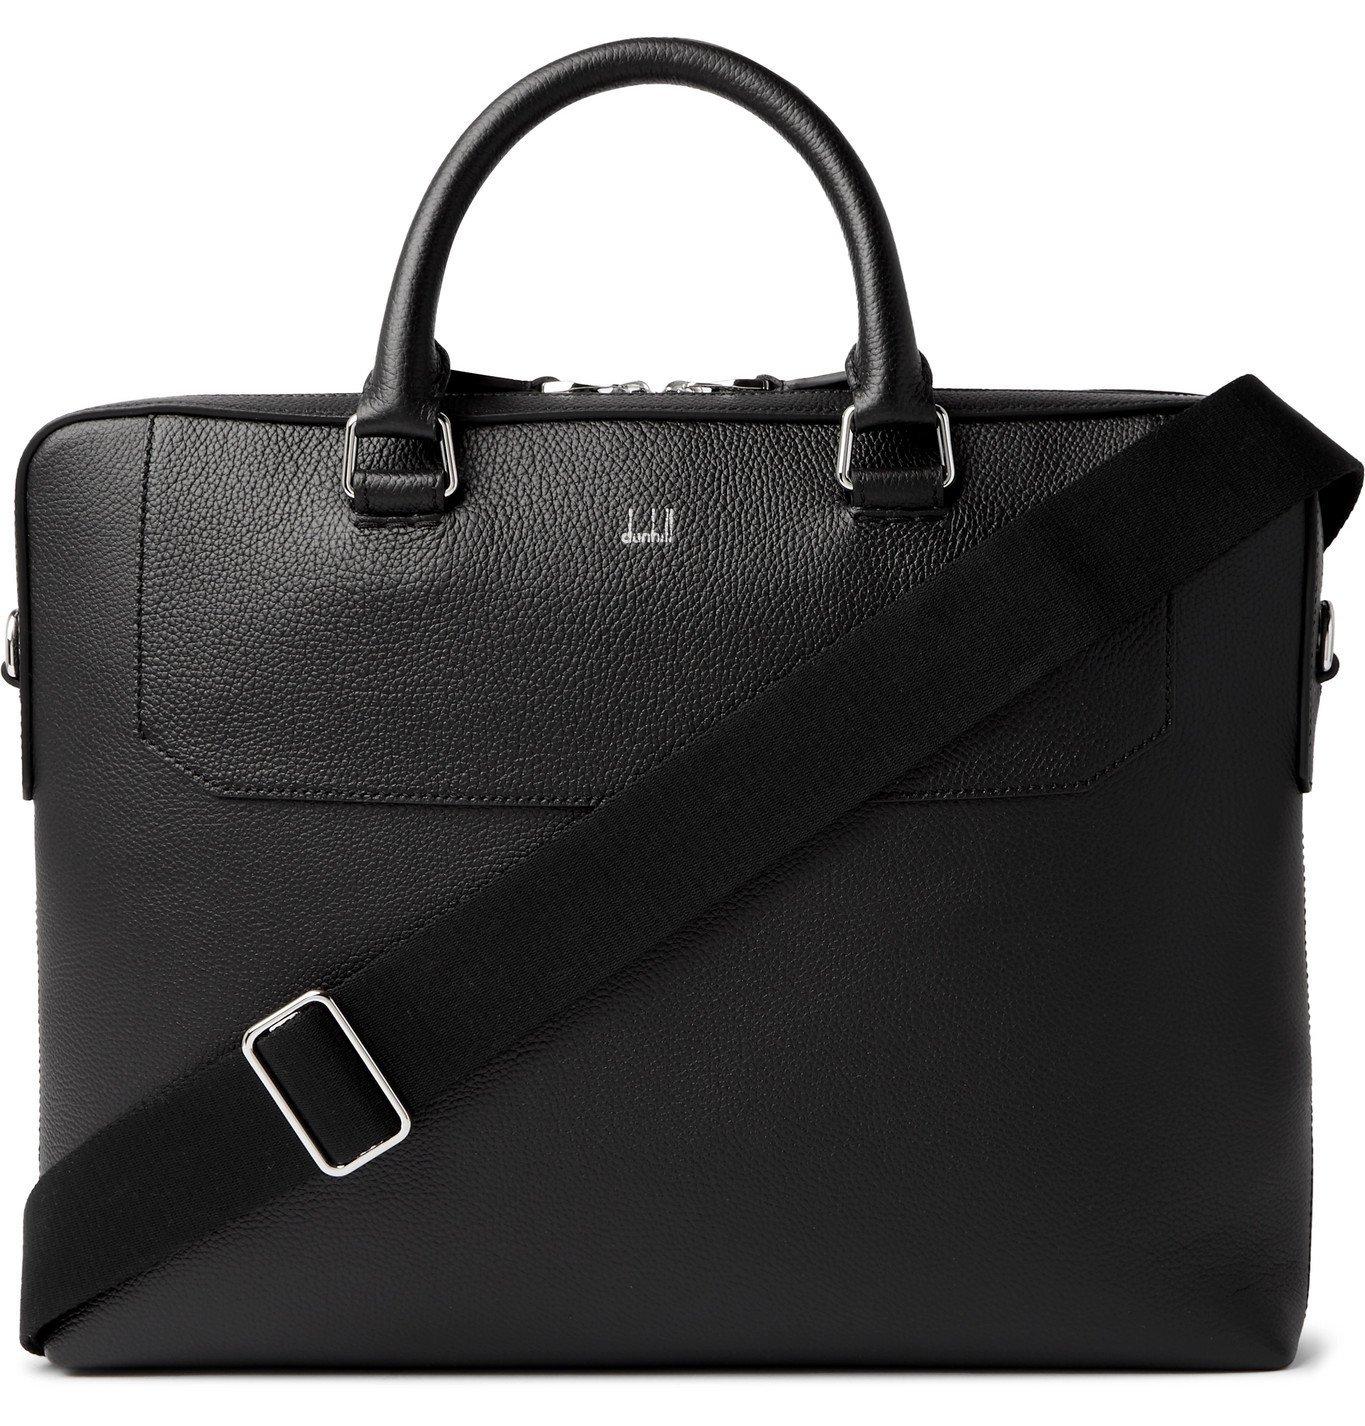 DUNHILL - Belgrave Full-Grain Leather Briefcase - Black